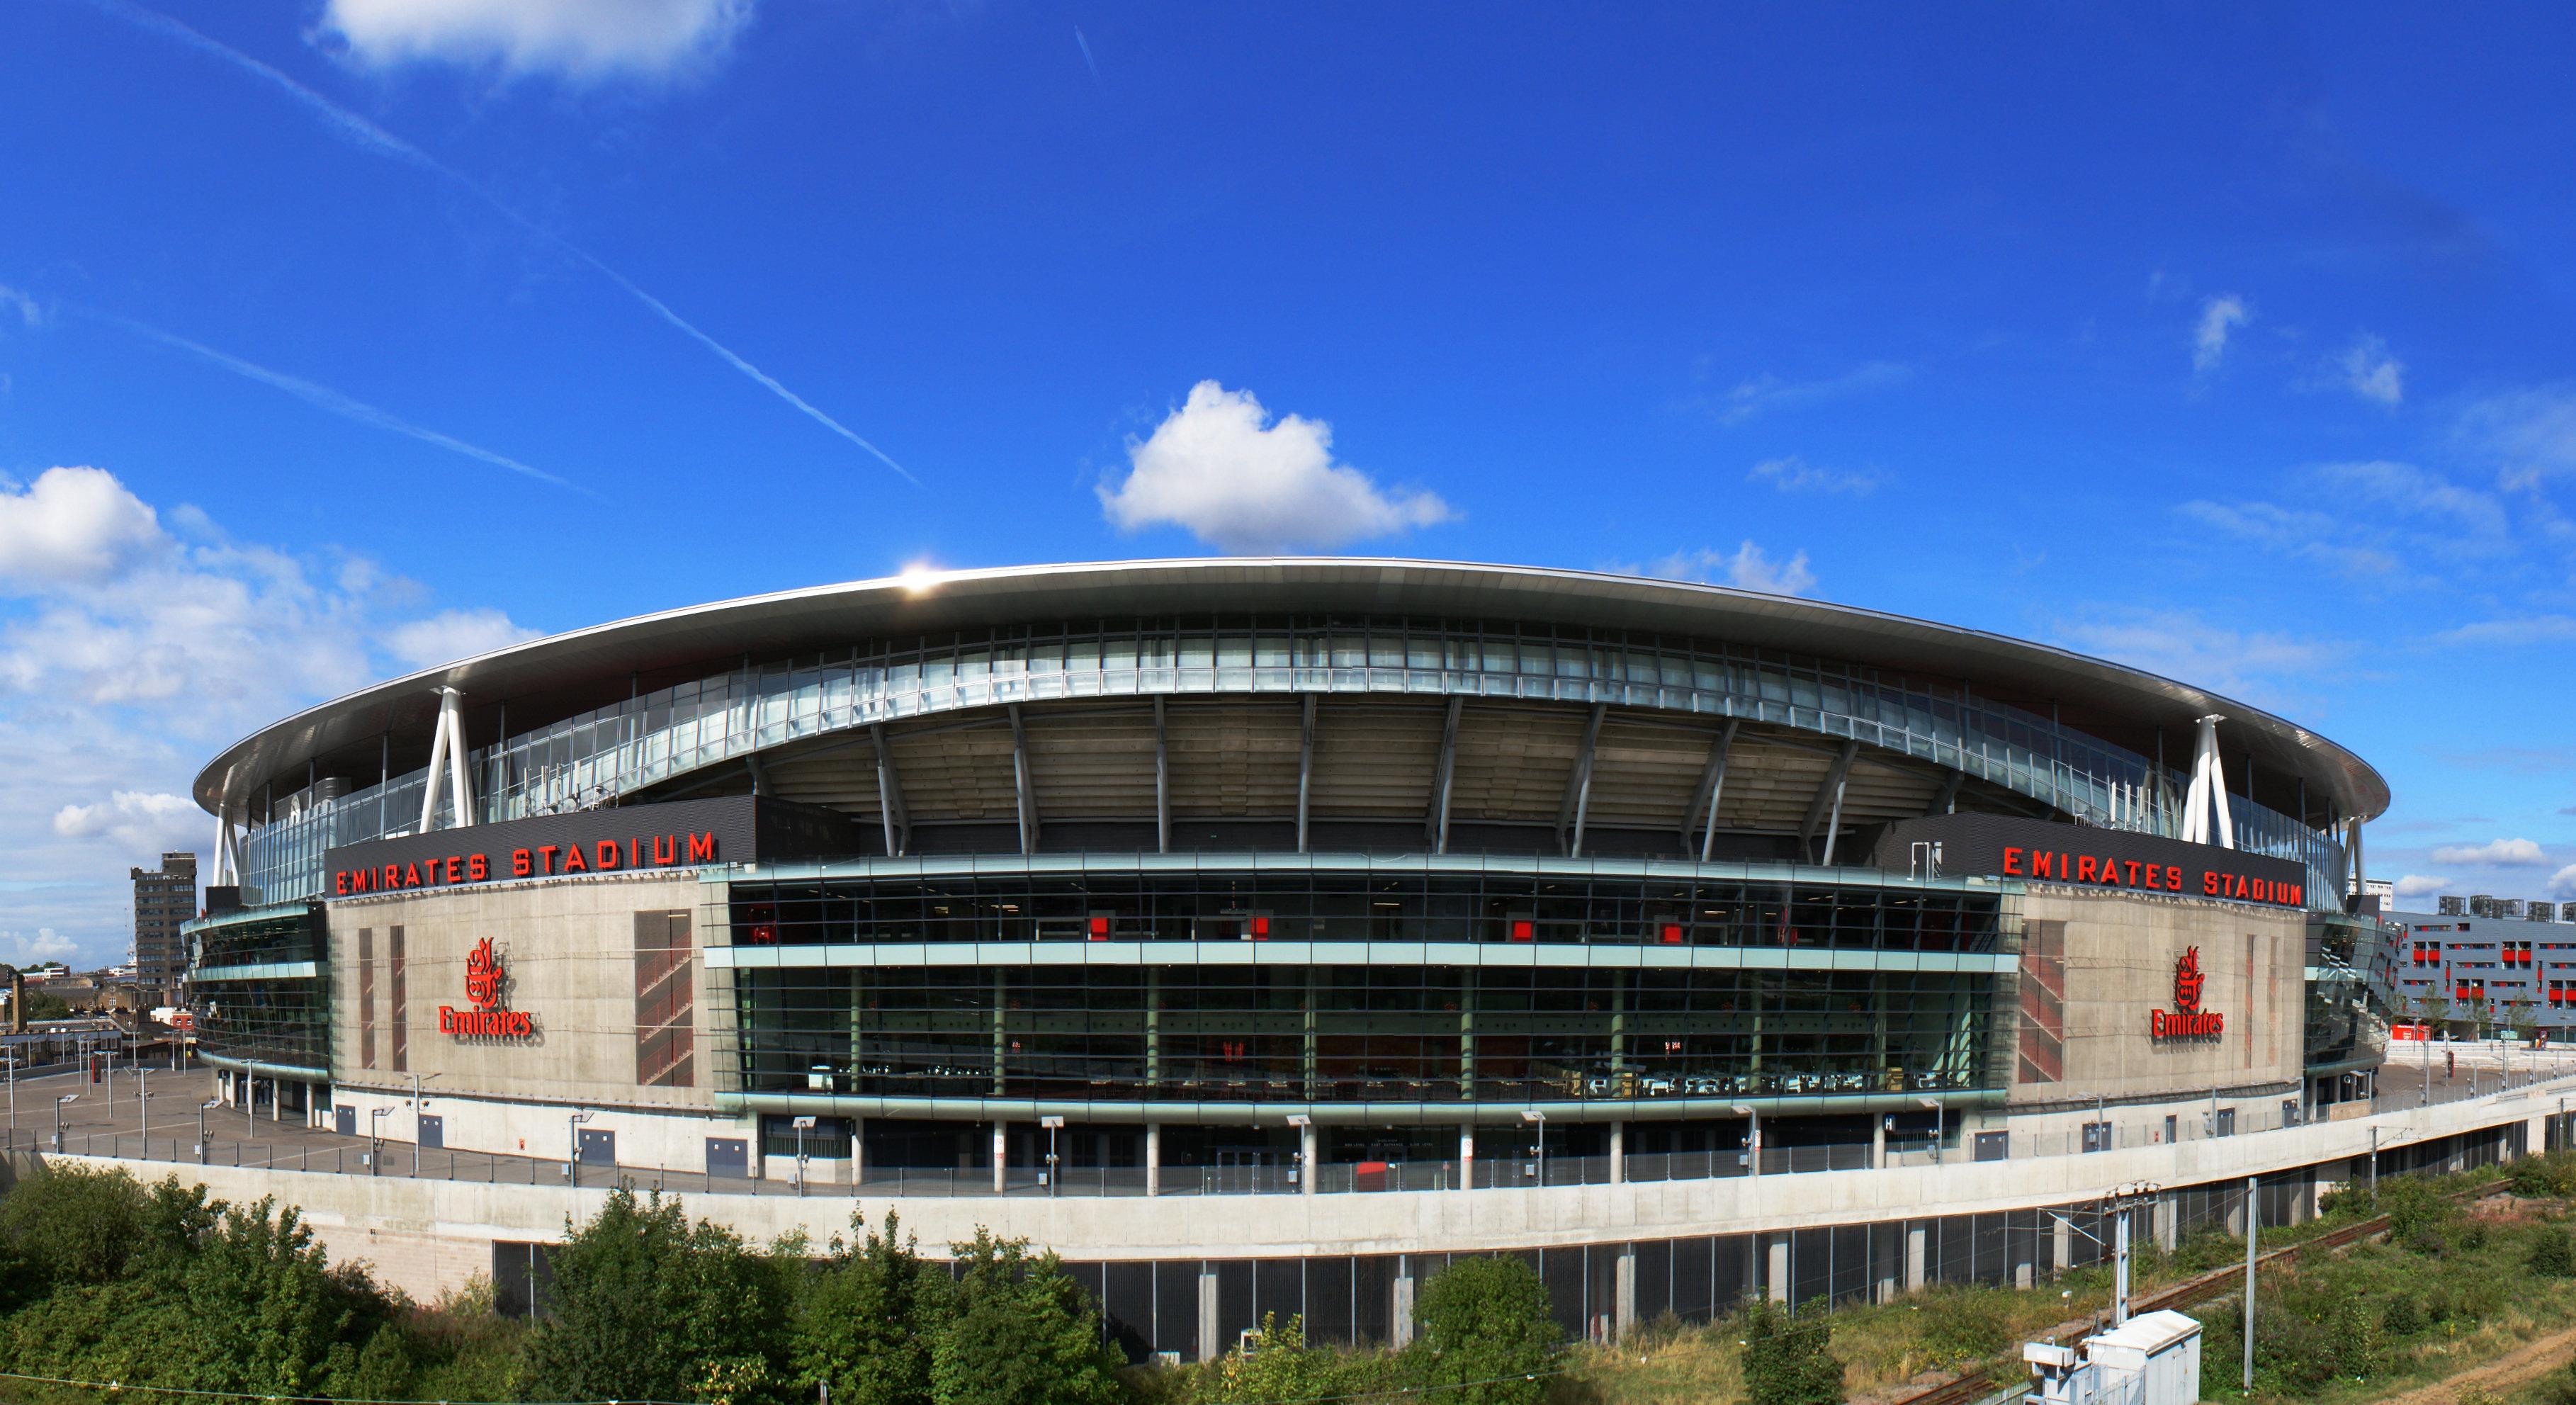 emirates stadium wikipedia